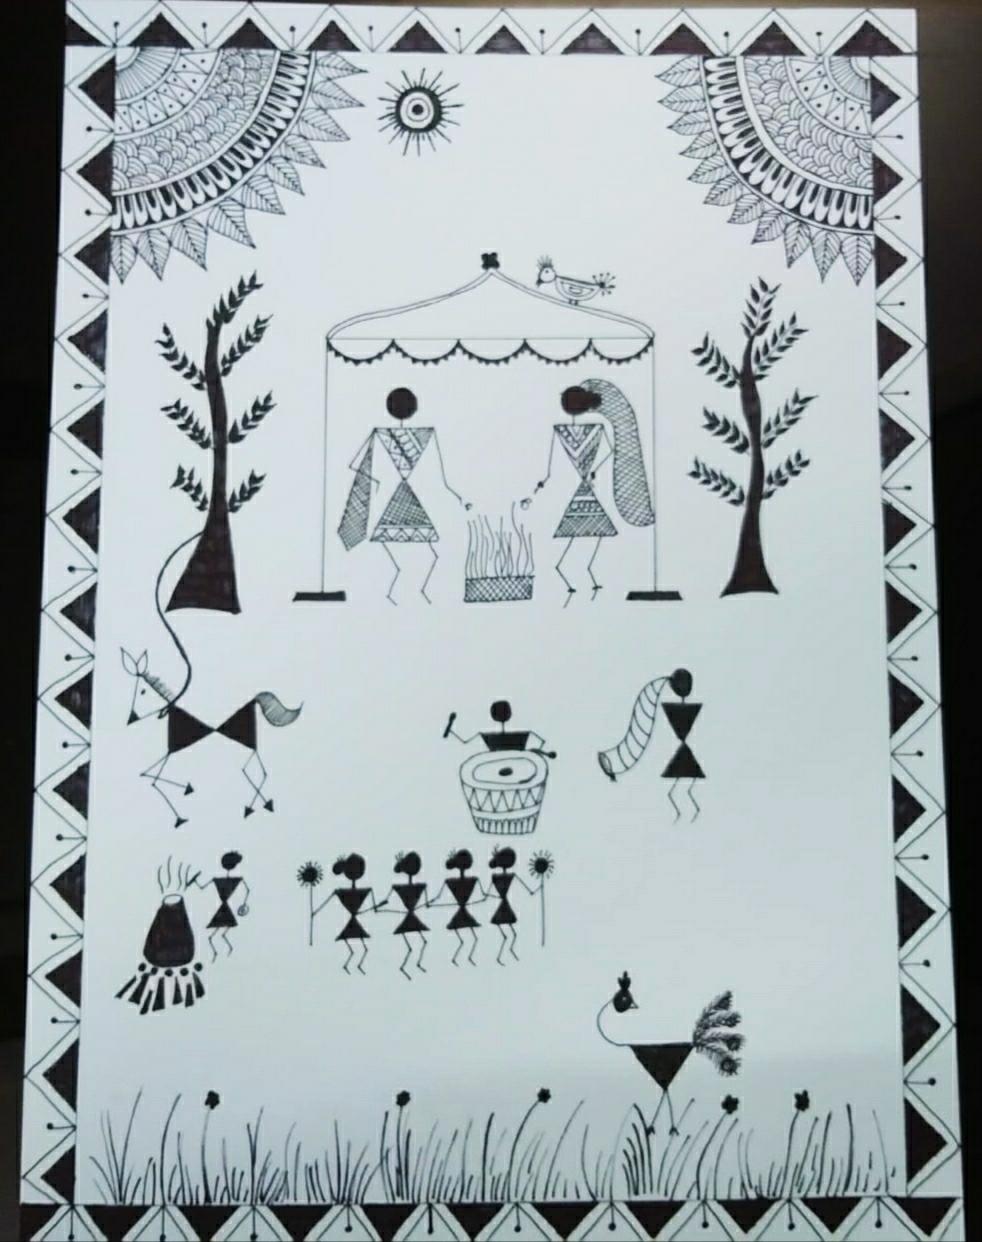 Warli Art Wedding Day Indian Traditional Tribal Art Art Work By Jojo Hive